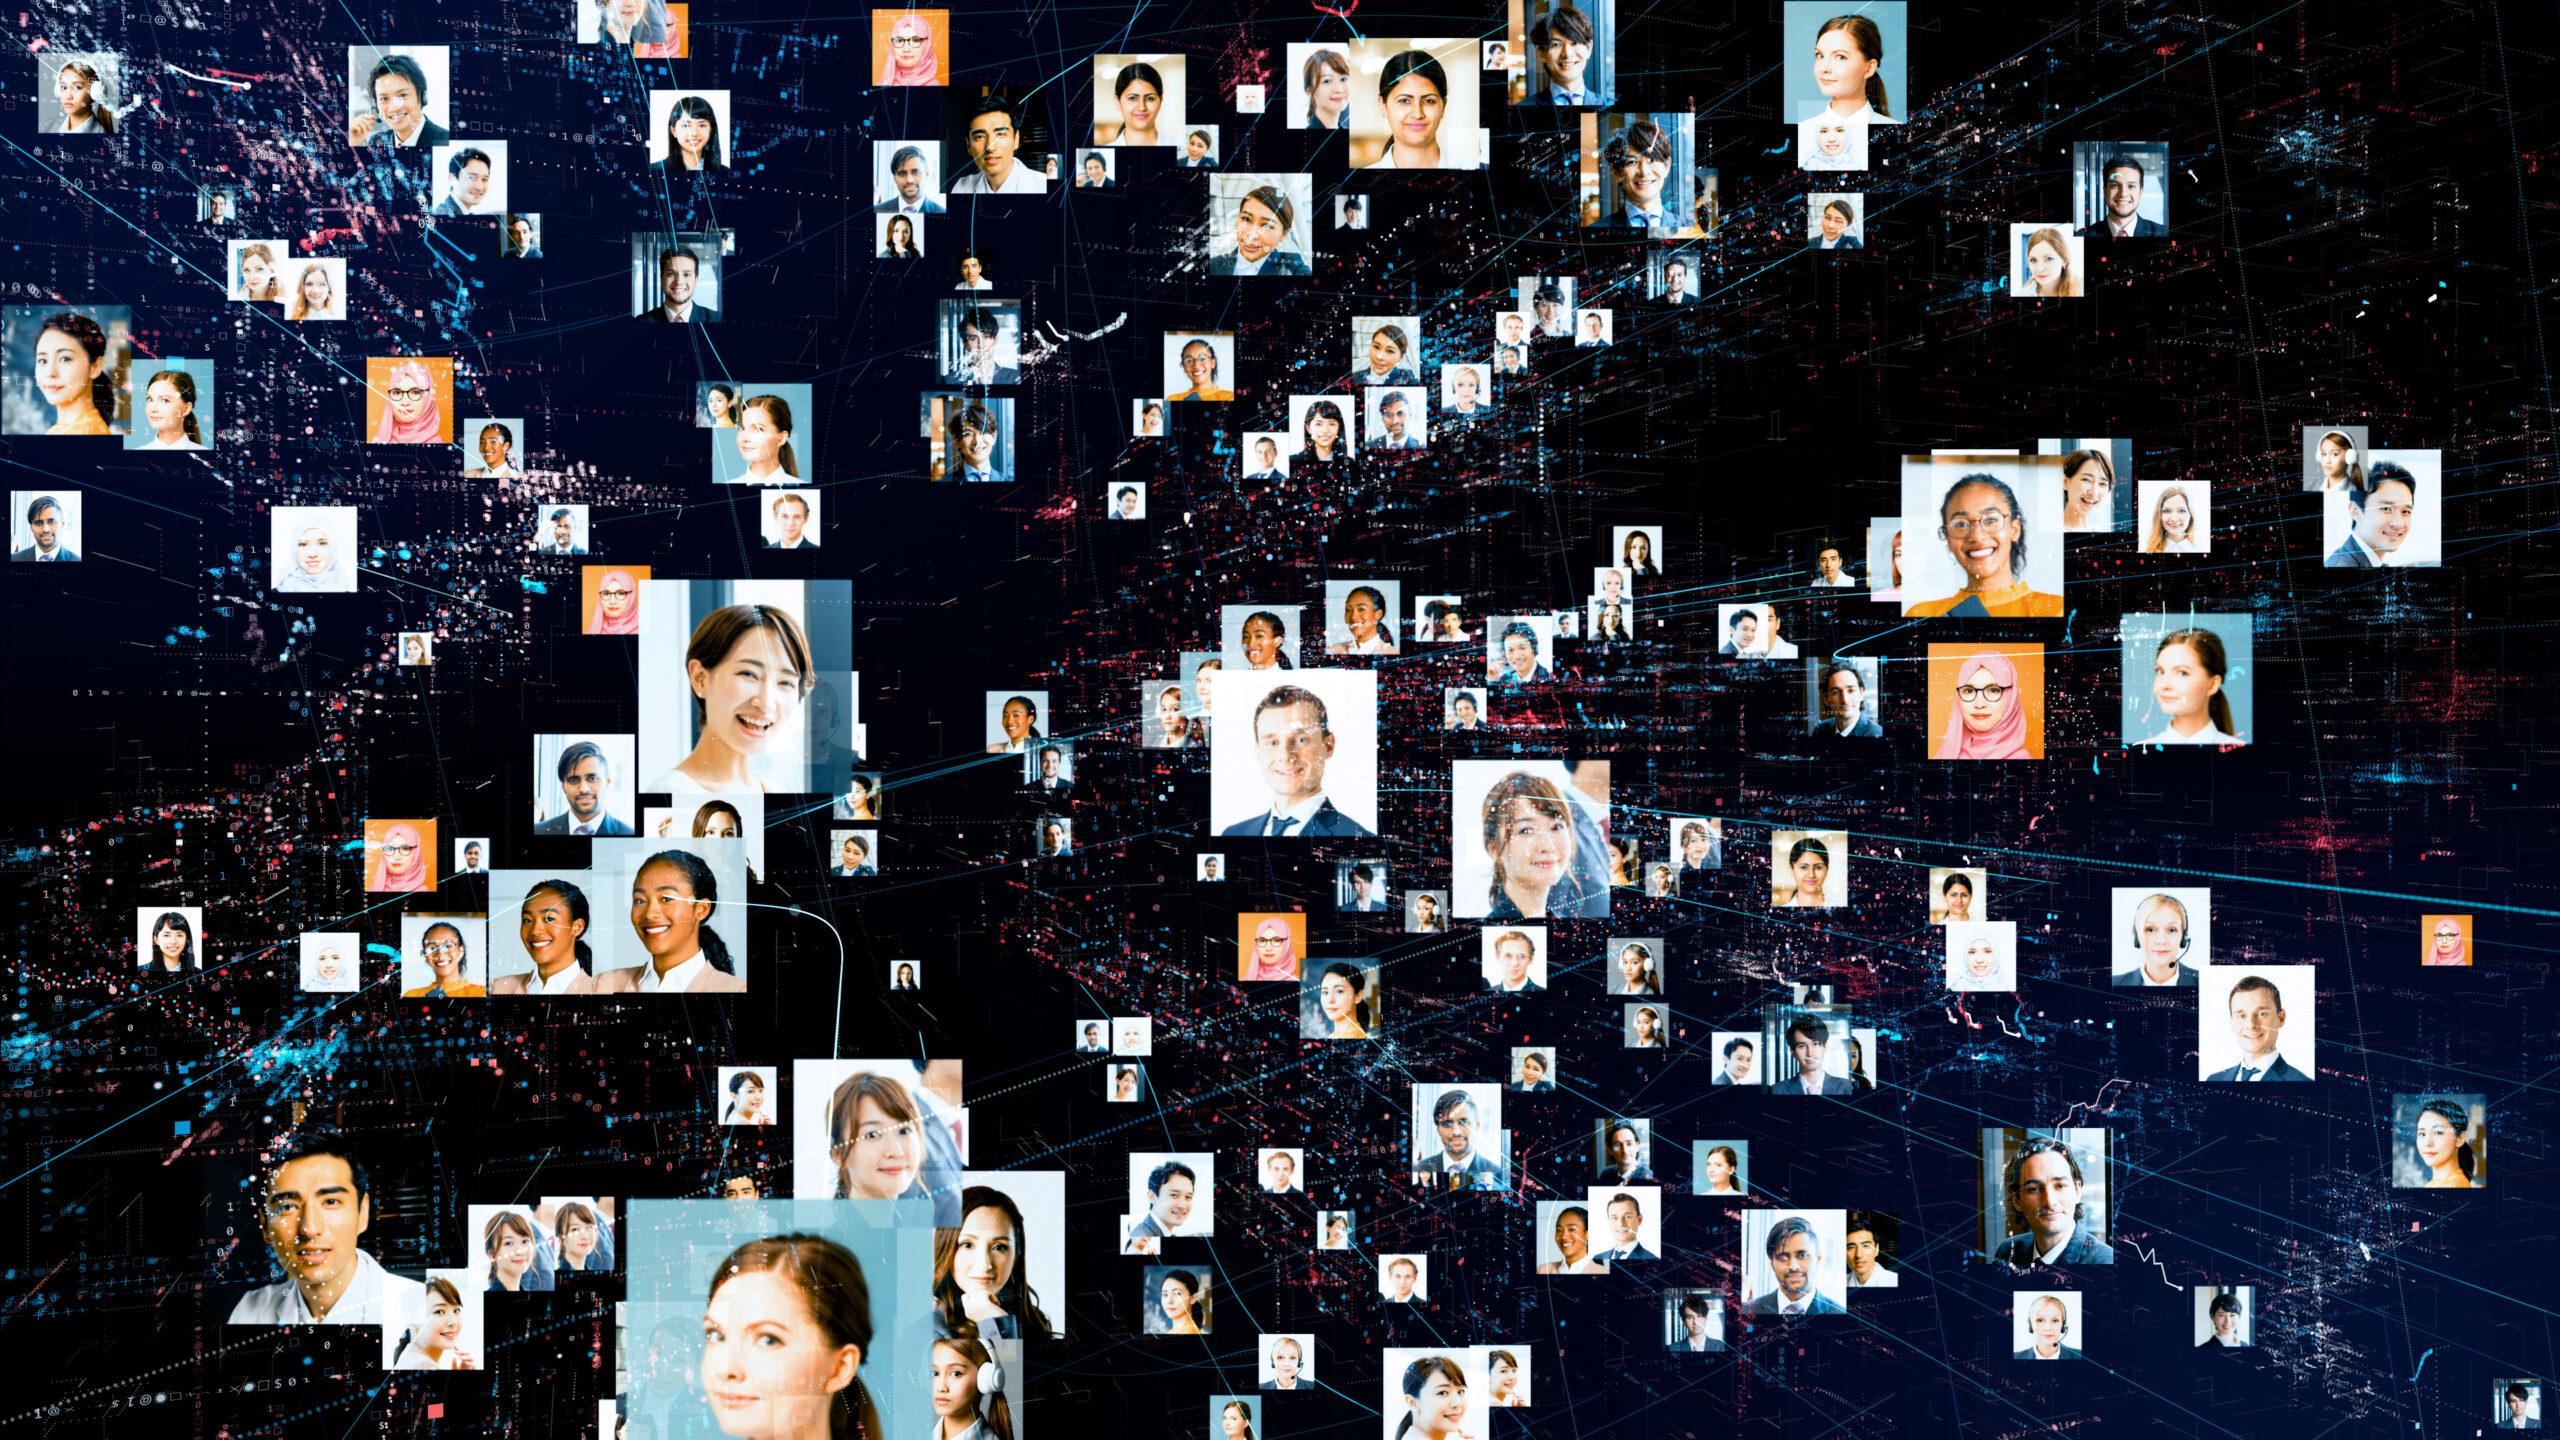 Human computer interaction concept image. Image credit: iStock